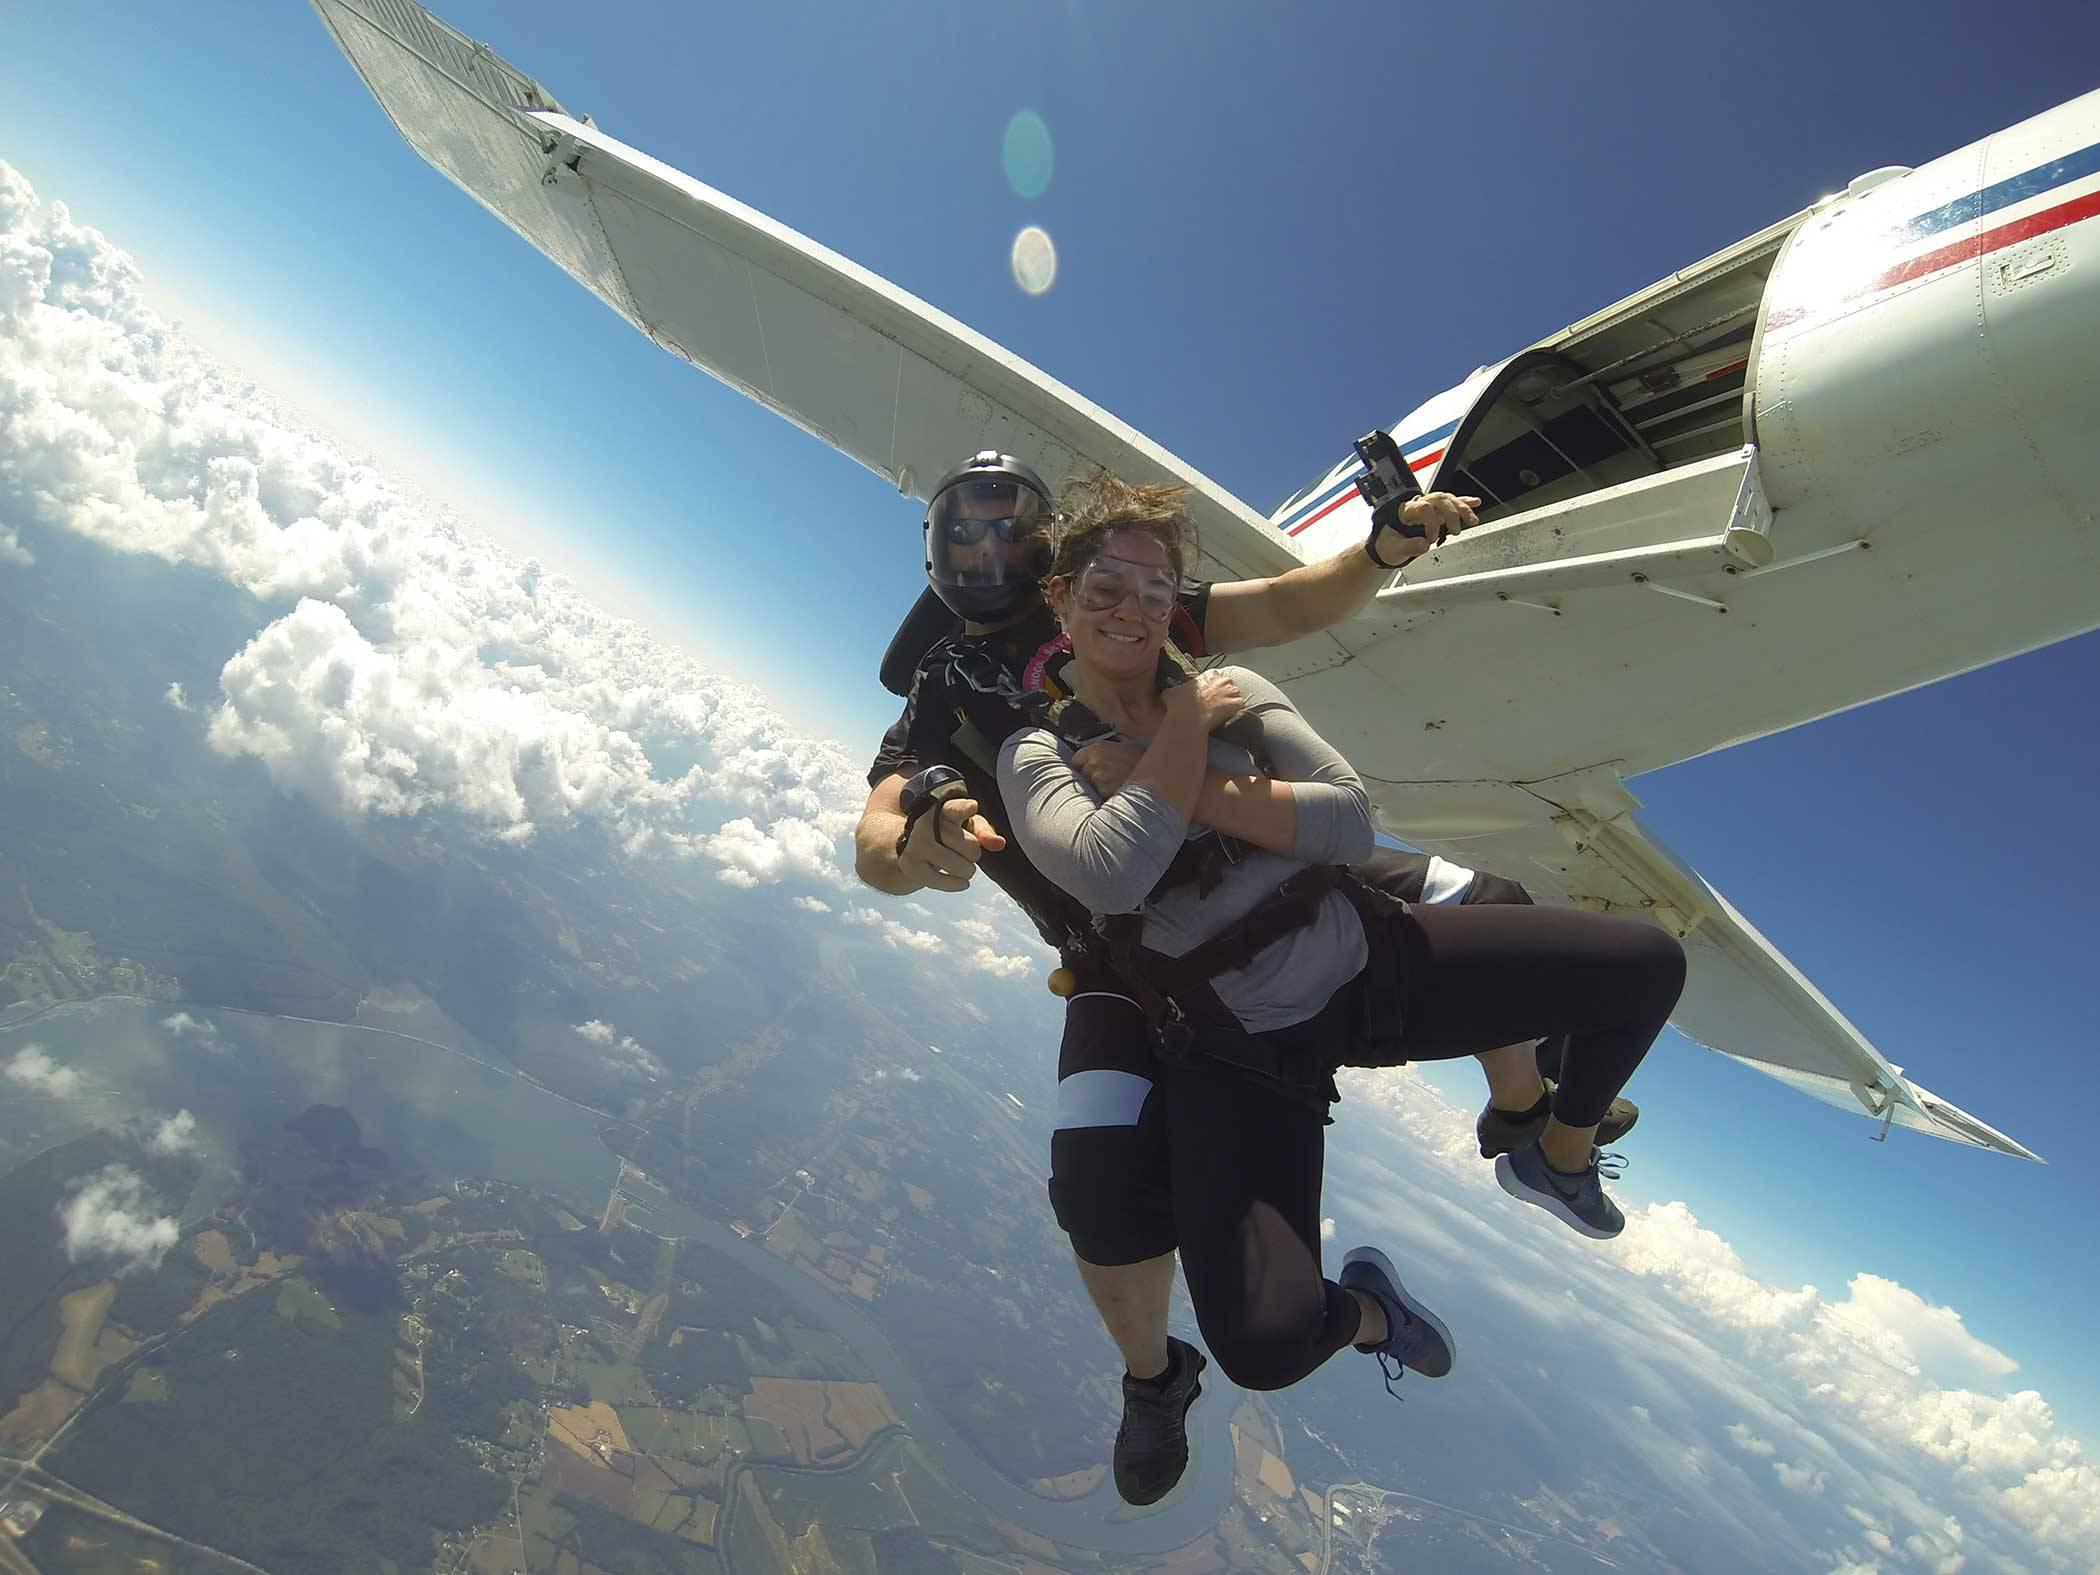 chattanooga-skydiving-company-33